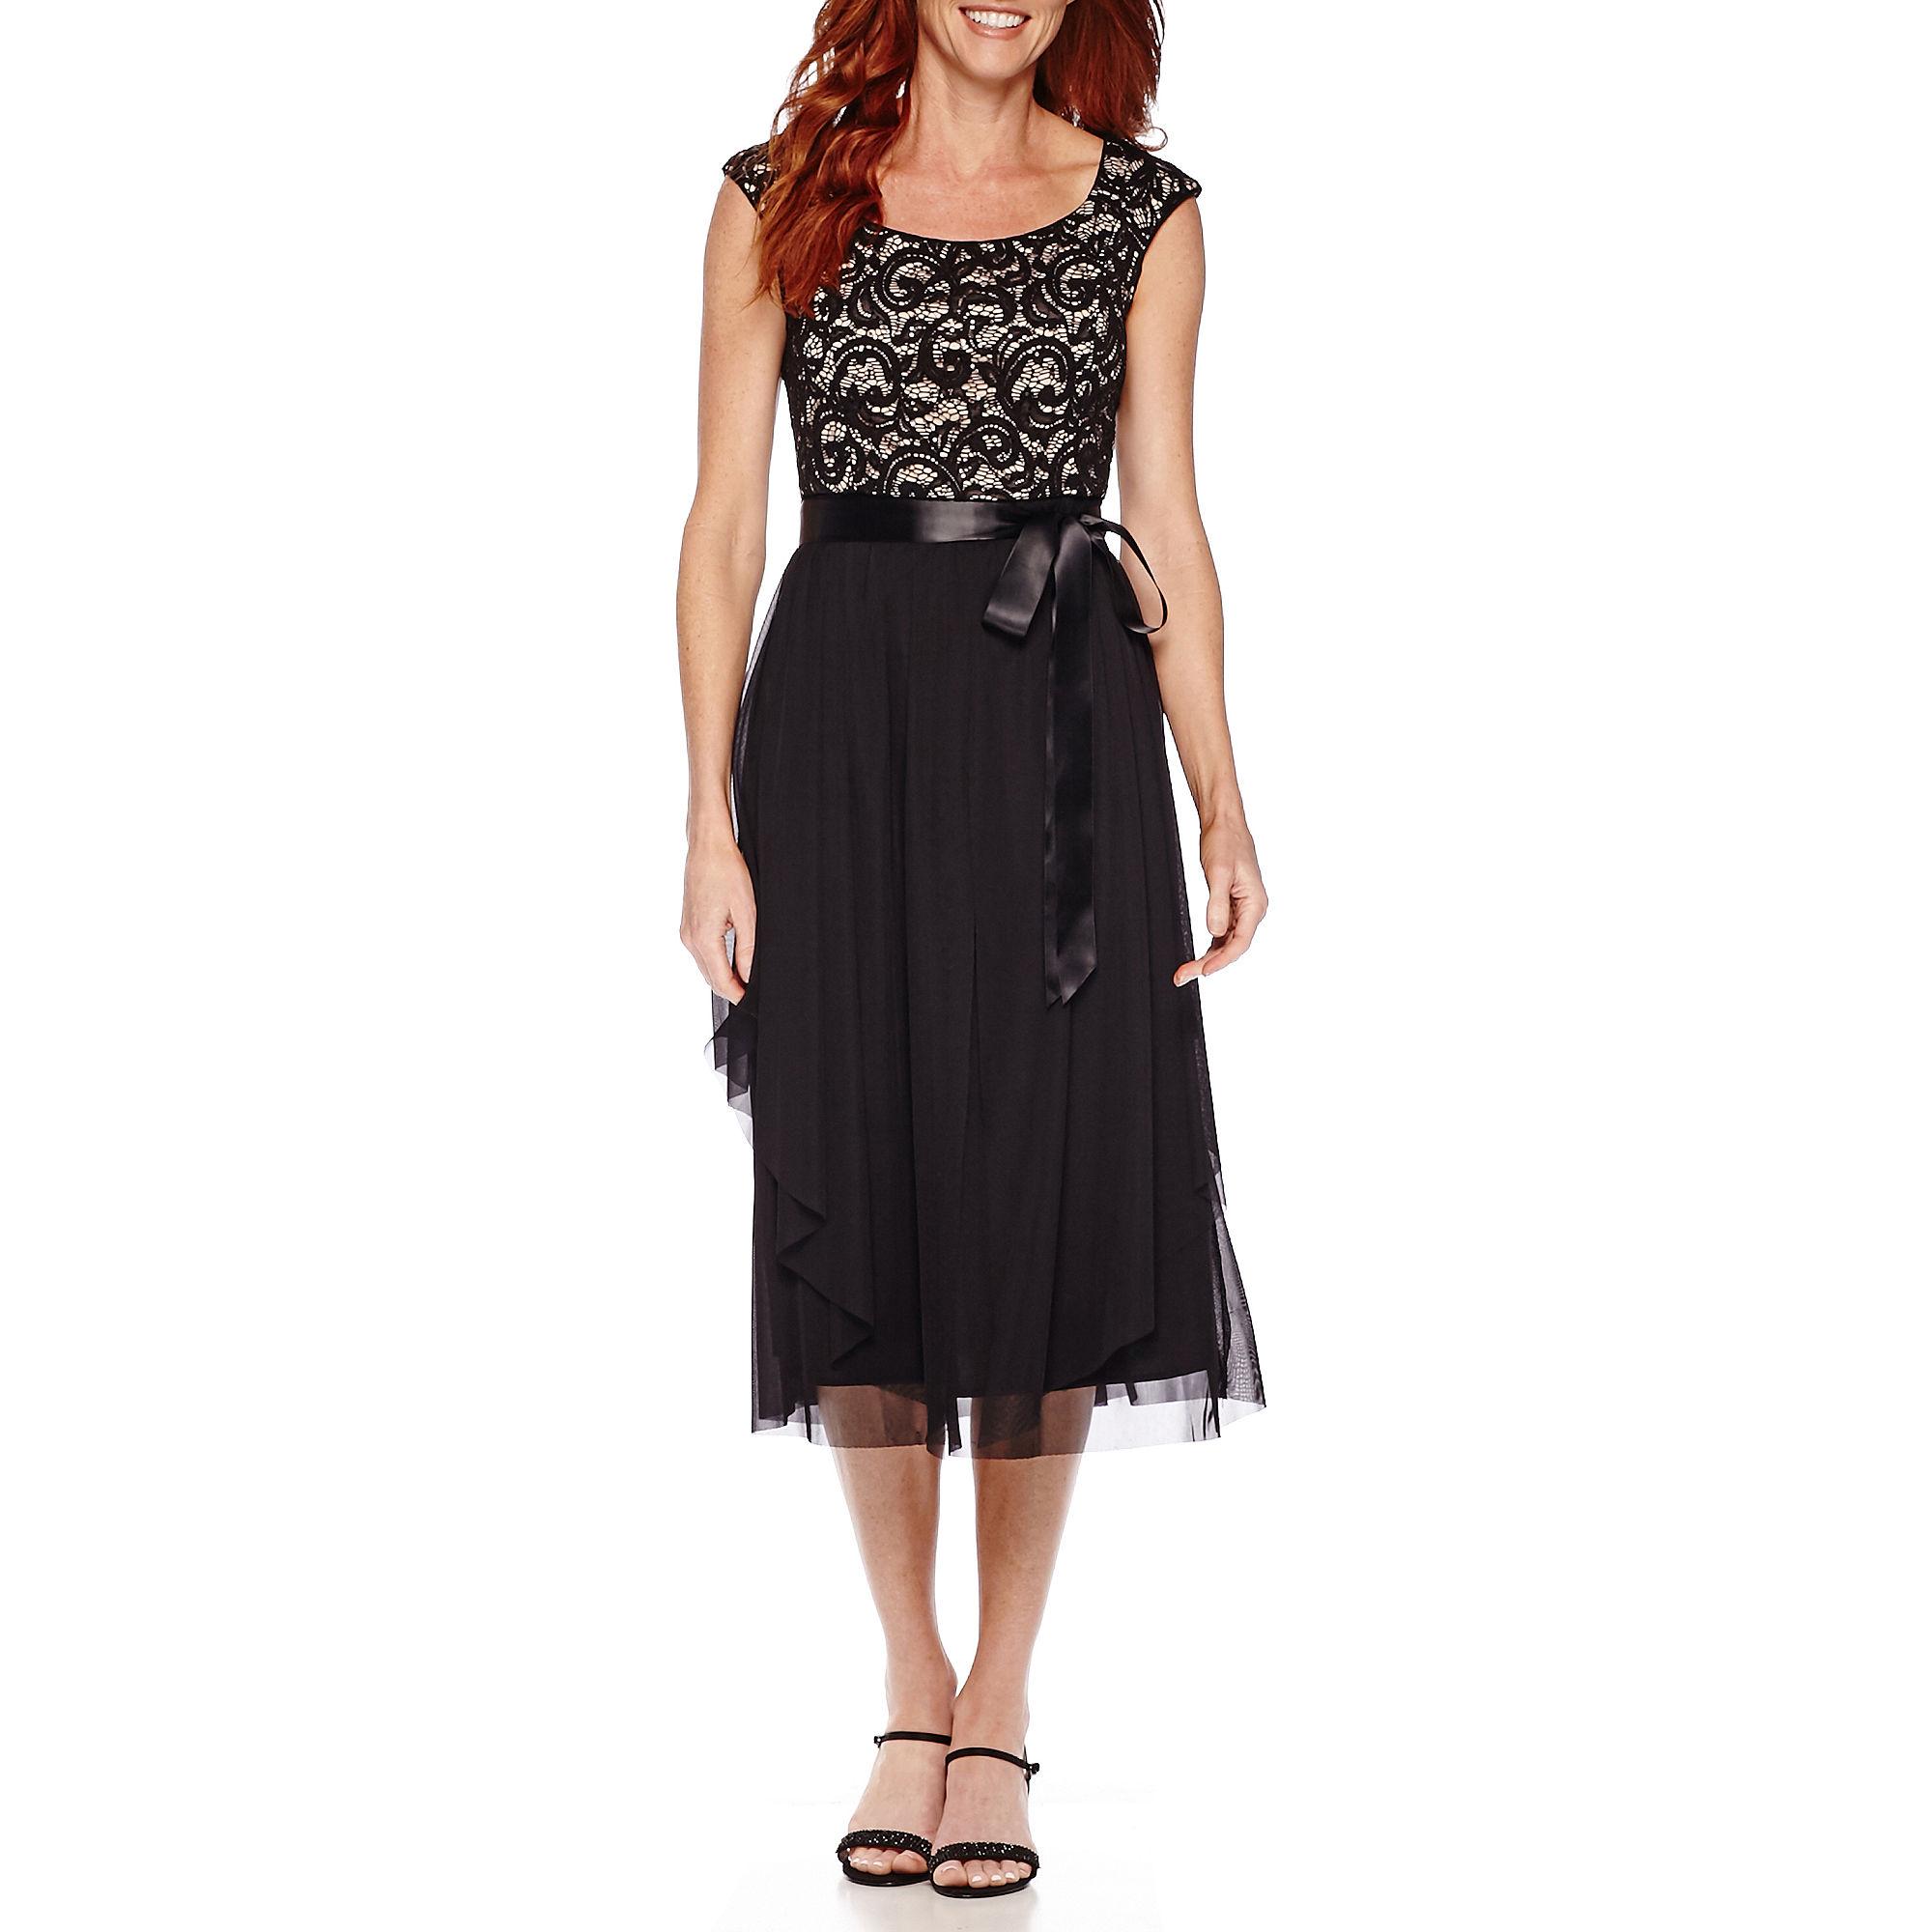 Dresses from ross -  Ross Womens Dresses Ross Formal Dresses For Search